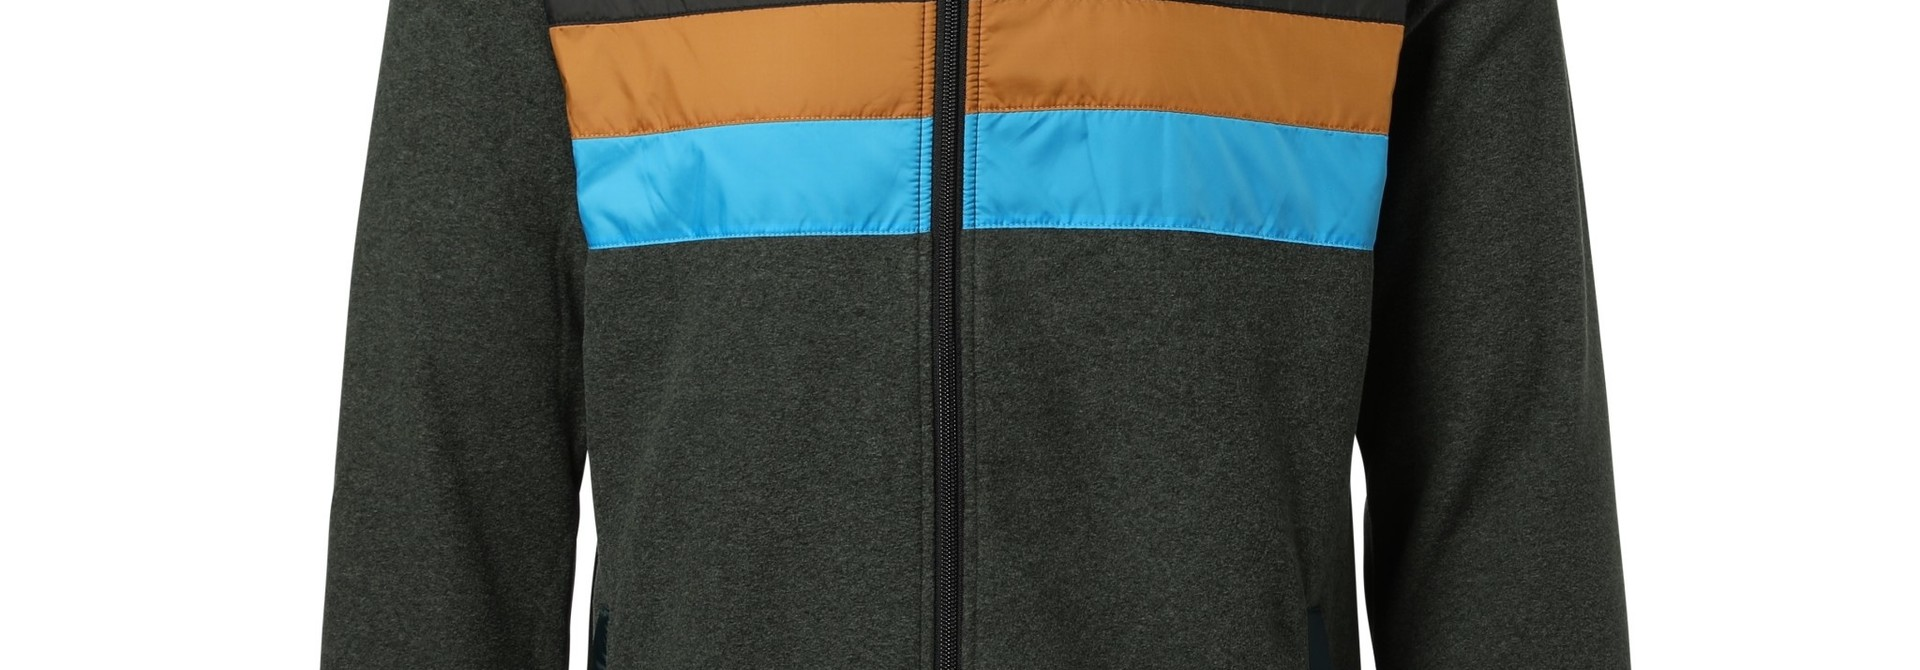 Cotopaxi M's Teca Fleece Jacket